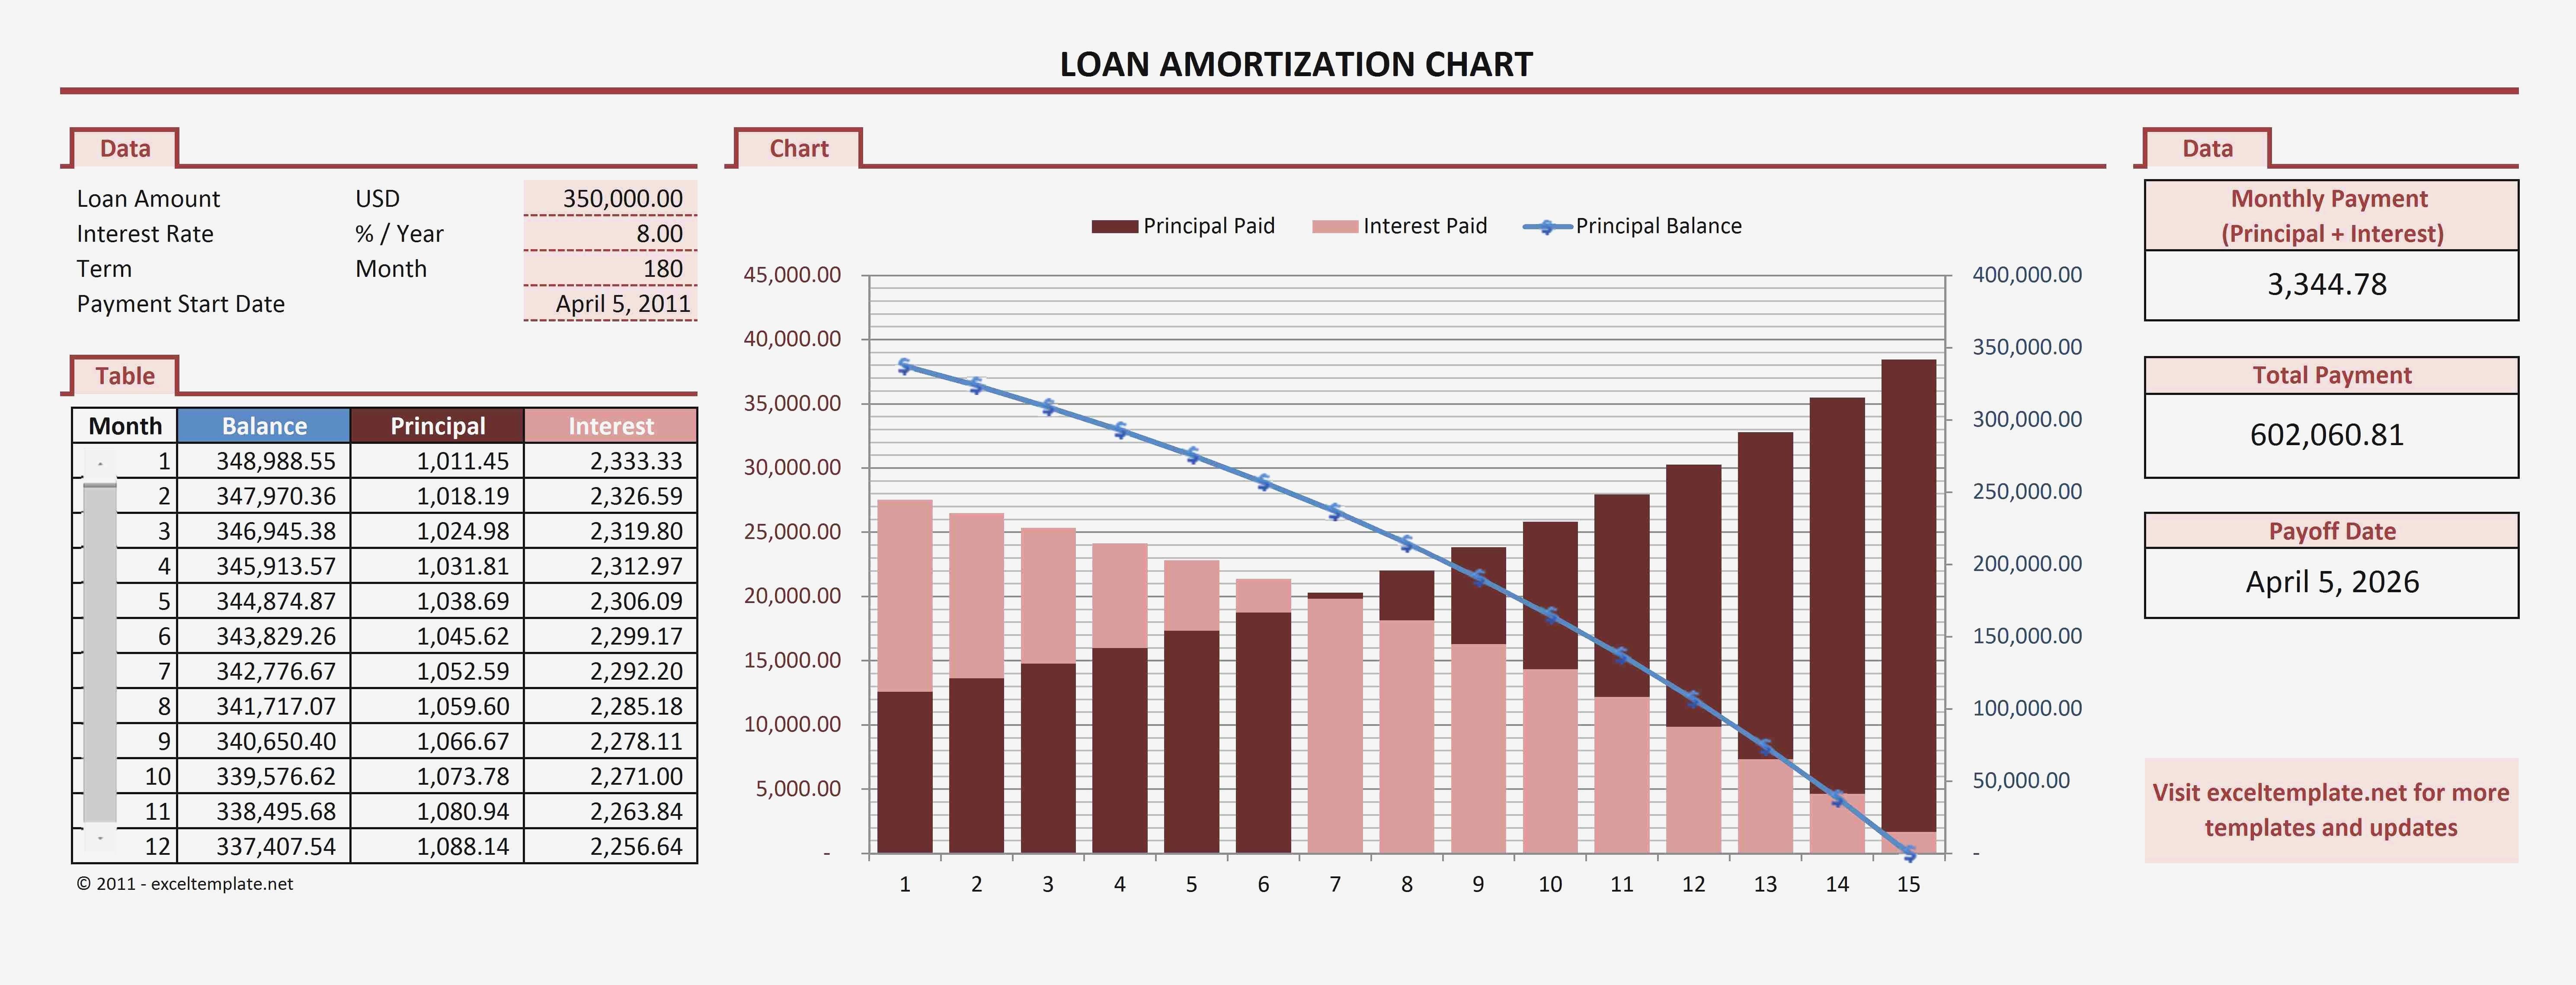 Balloon Payment Caspreadsheet Mortgage Amortization Spreadsheet And Mortgage Spreadsheet Template